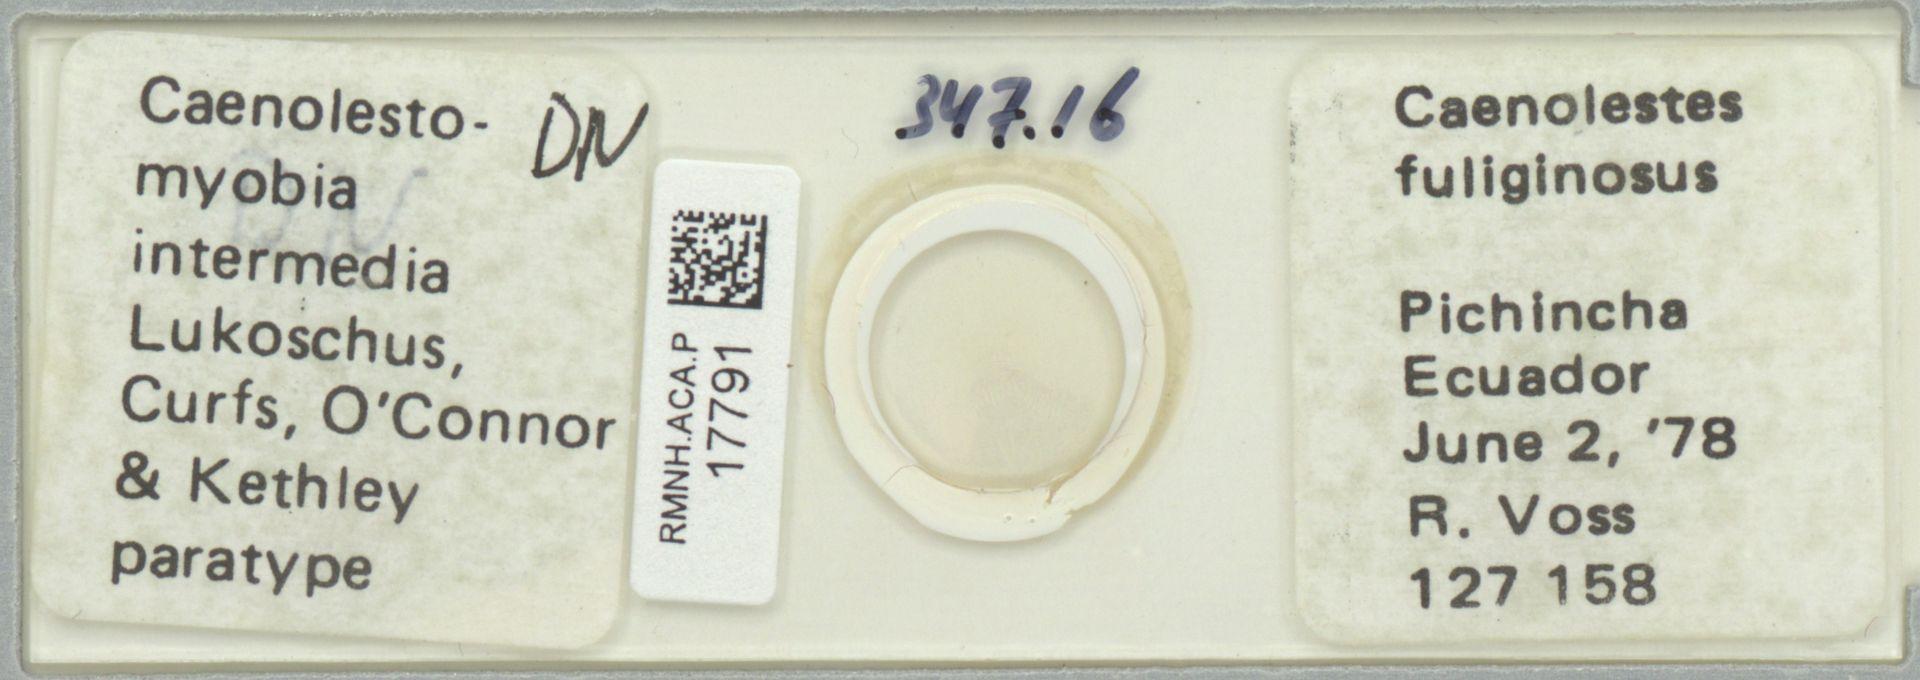 RMNH.ACA.P.17791   Caenolestomyobia intermedia